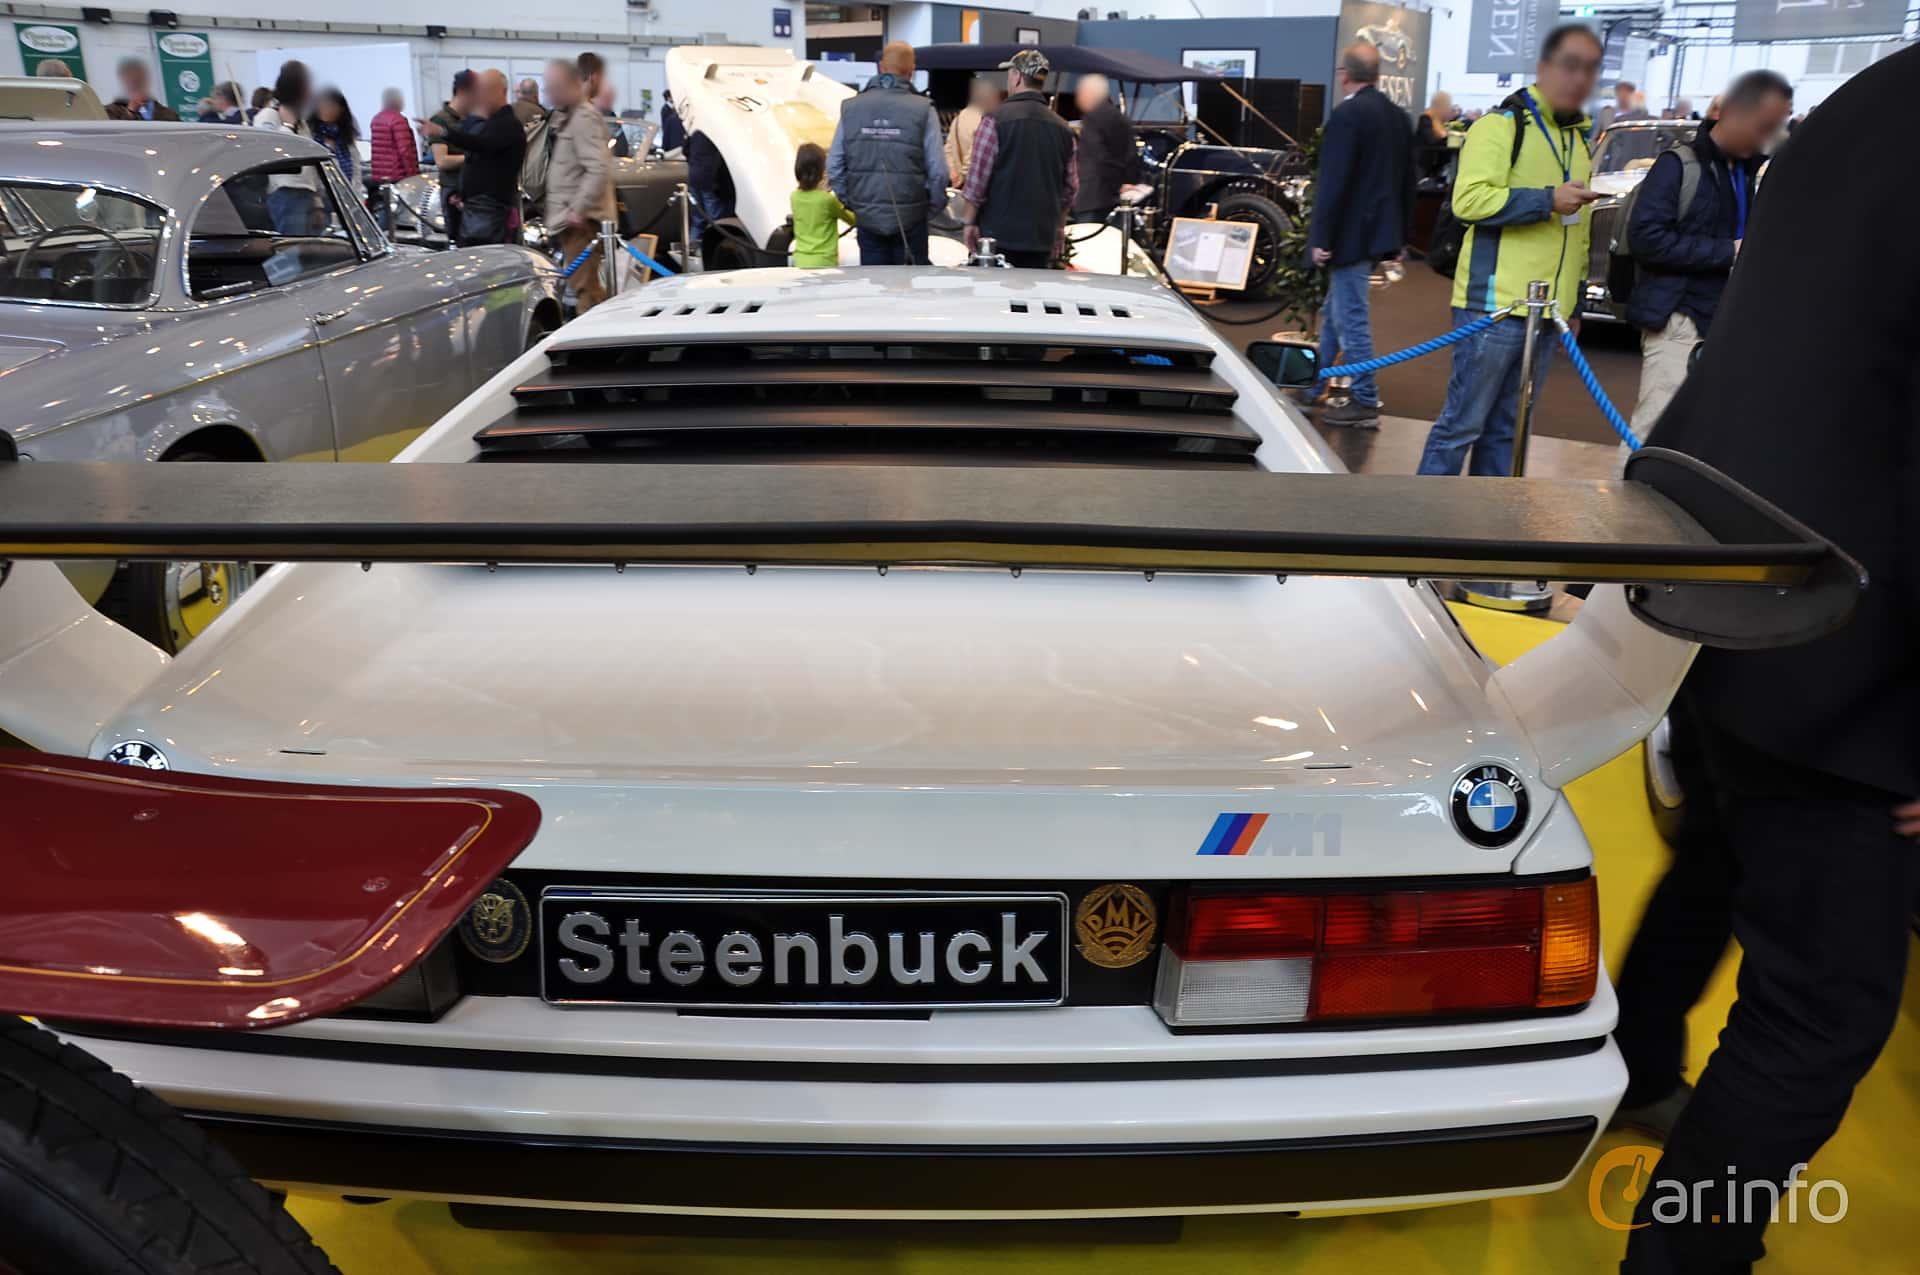 BMW M1 Procar  Manual, 477hp, 1979 at Techno Classica Essen 2019